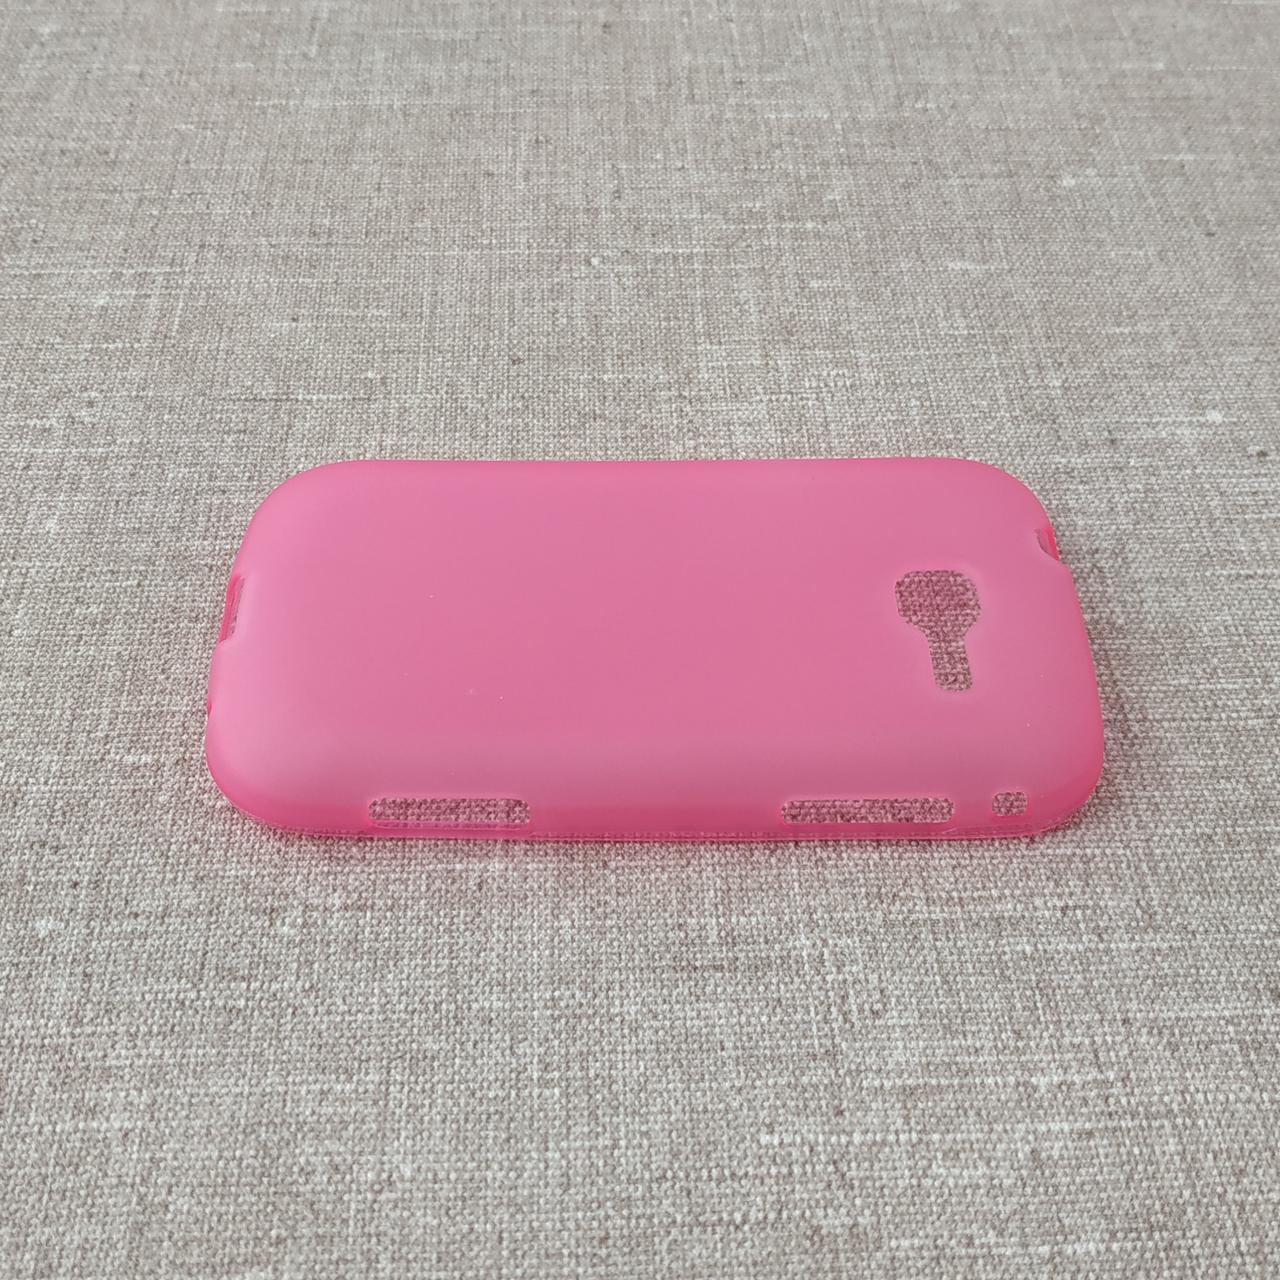 TPU Samsung S7390 pink